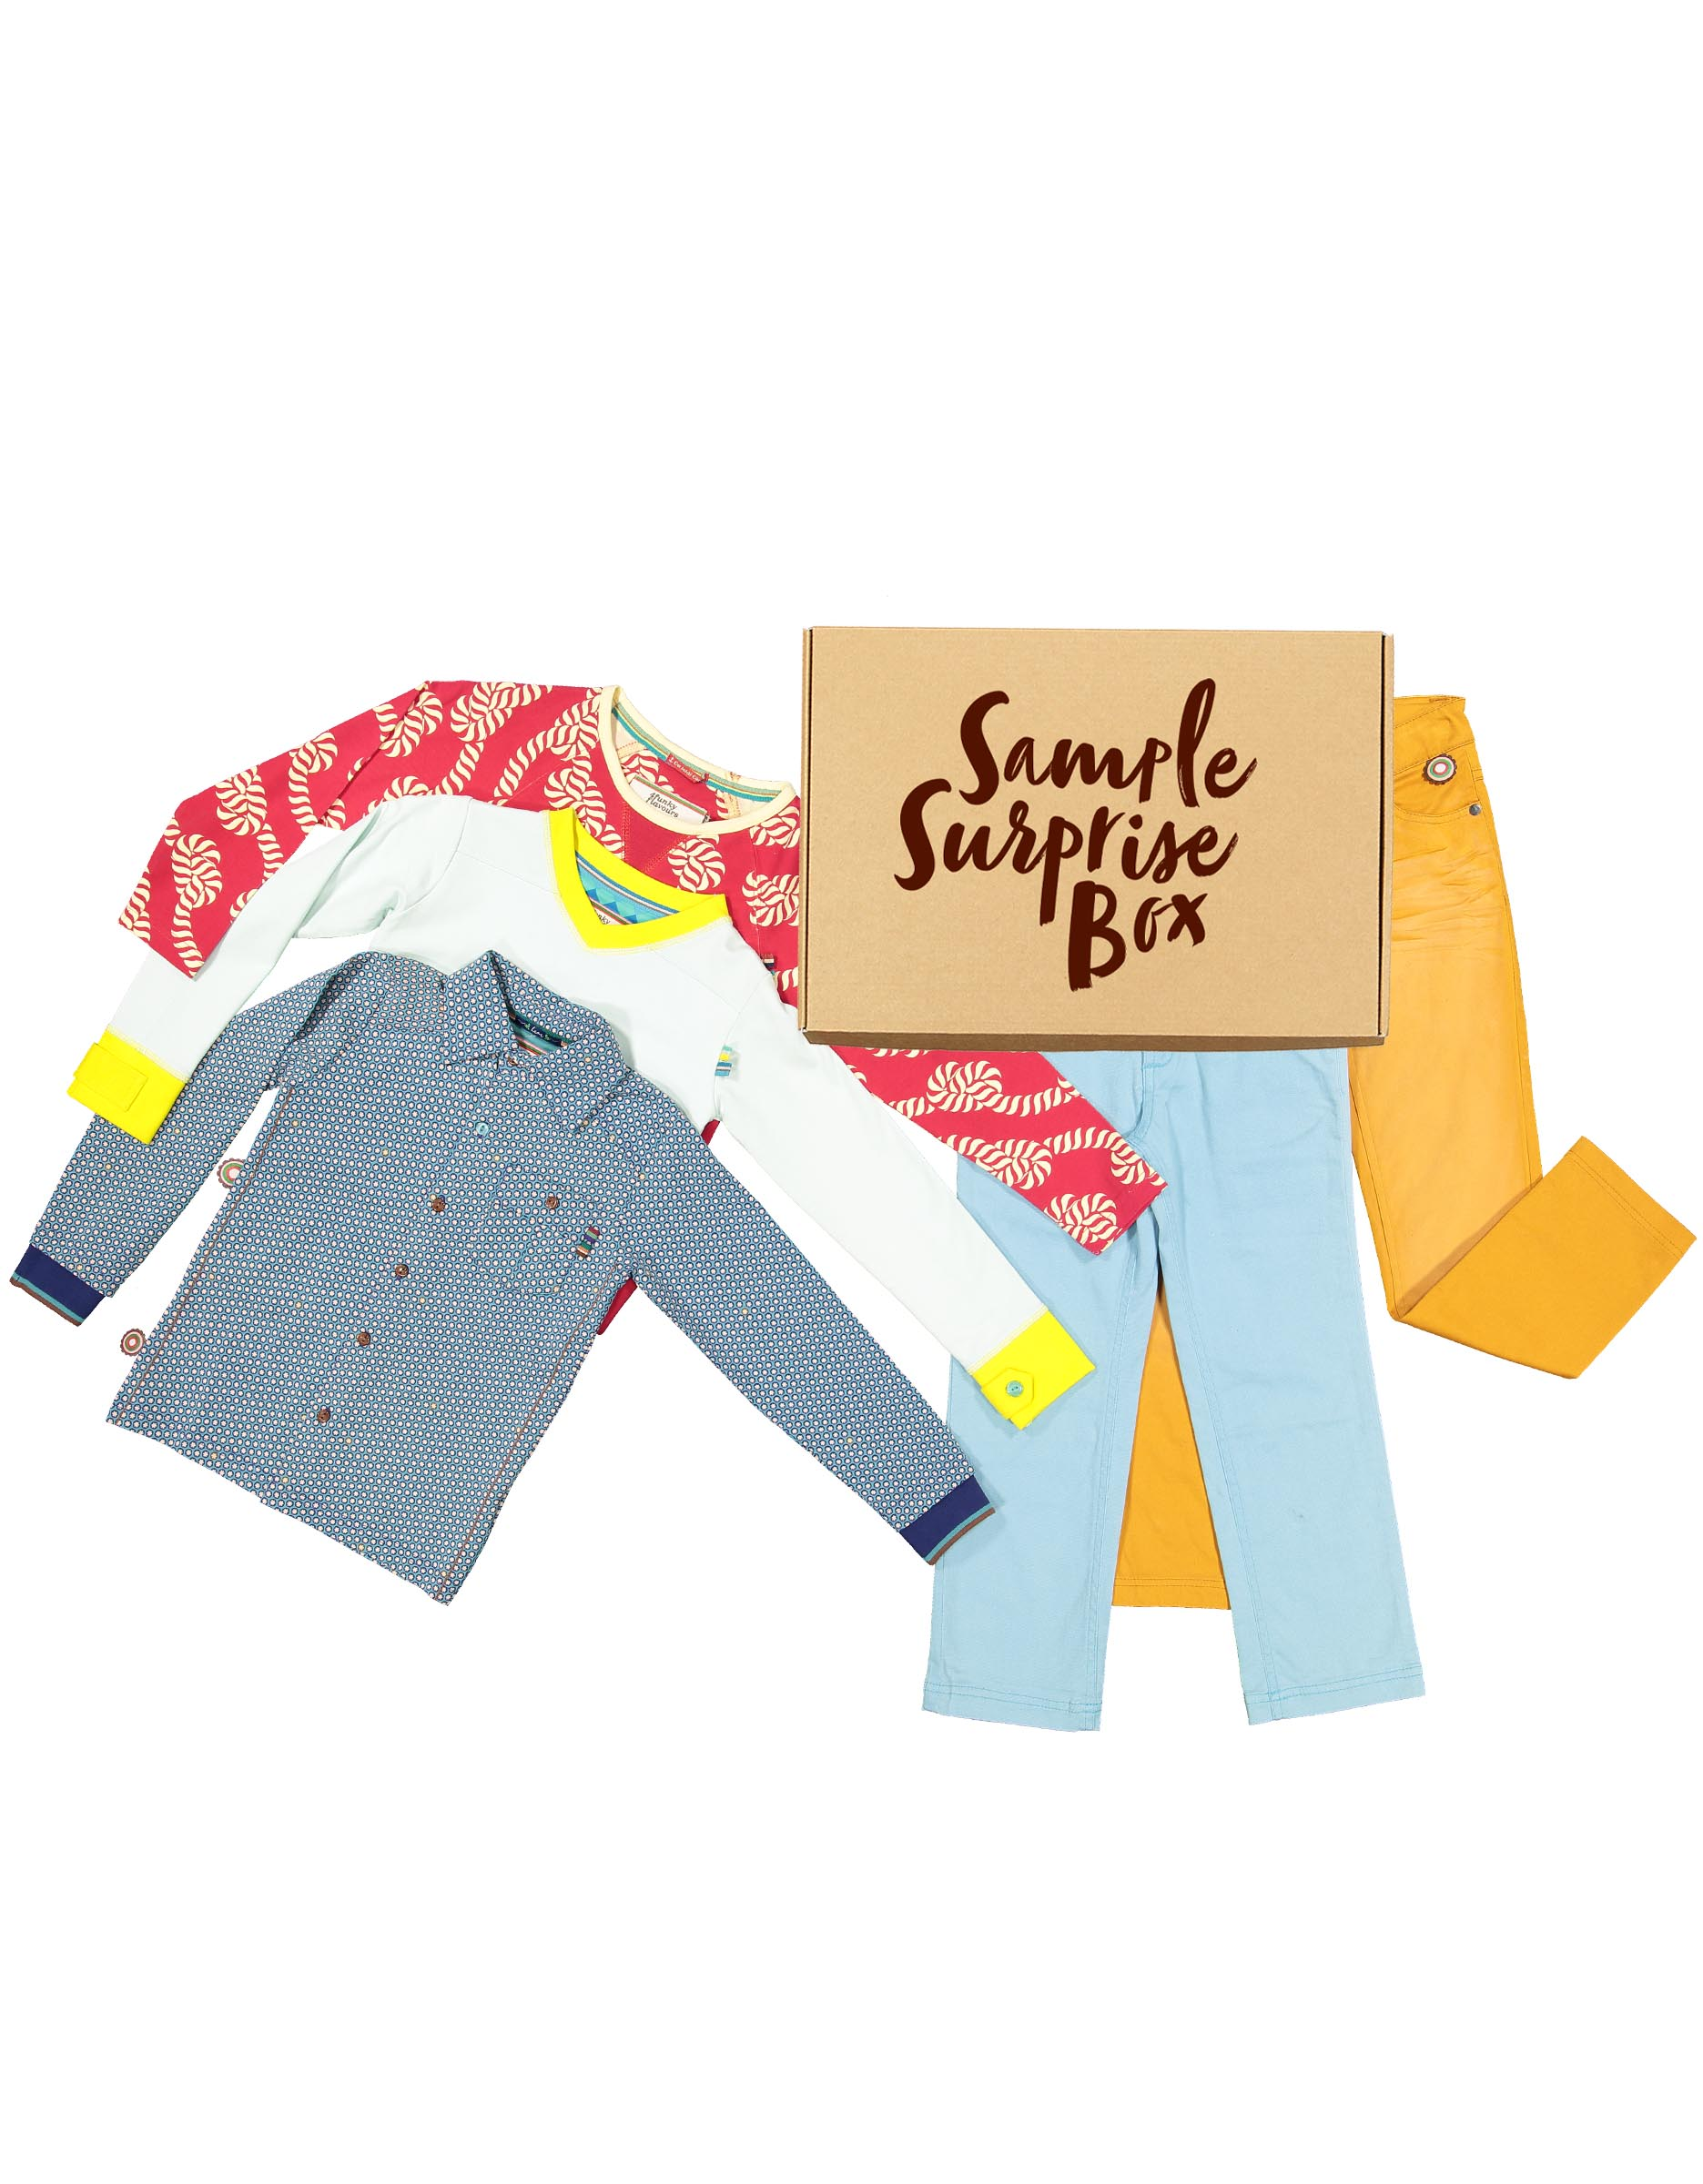 Sample surprise box